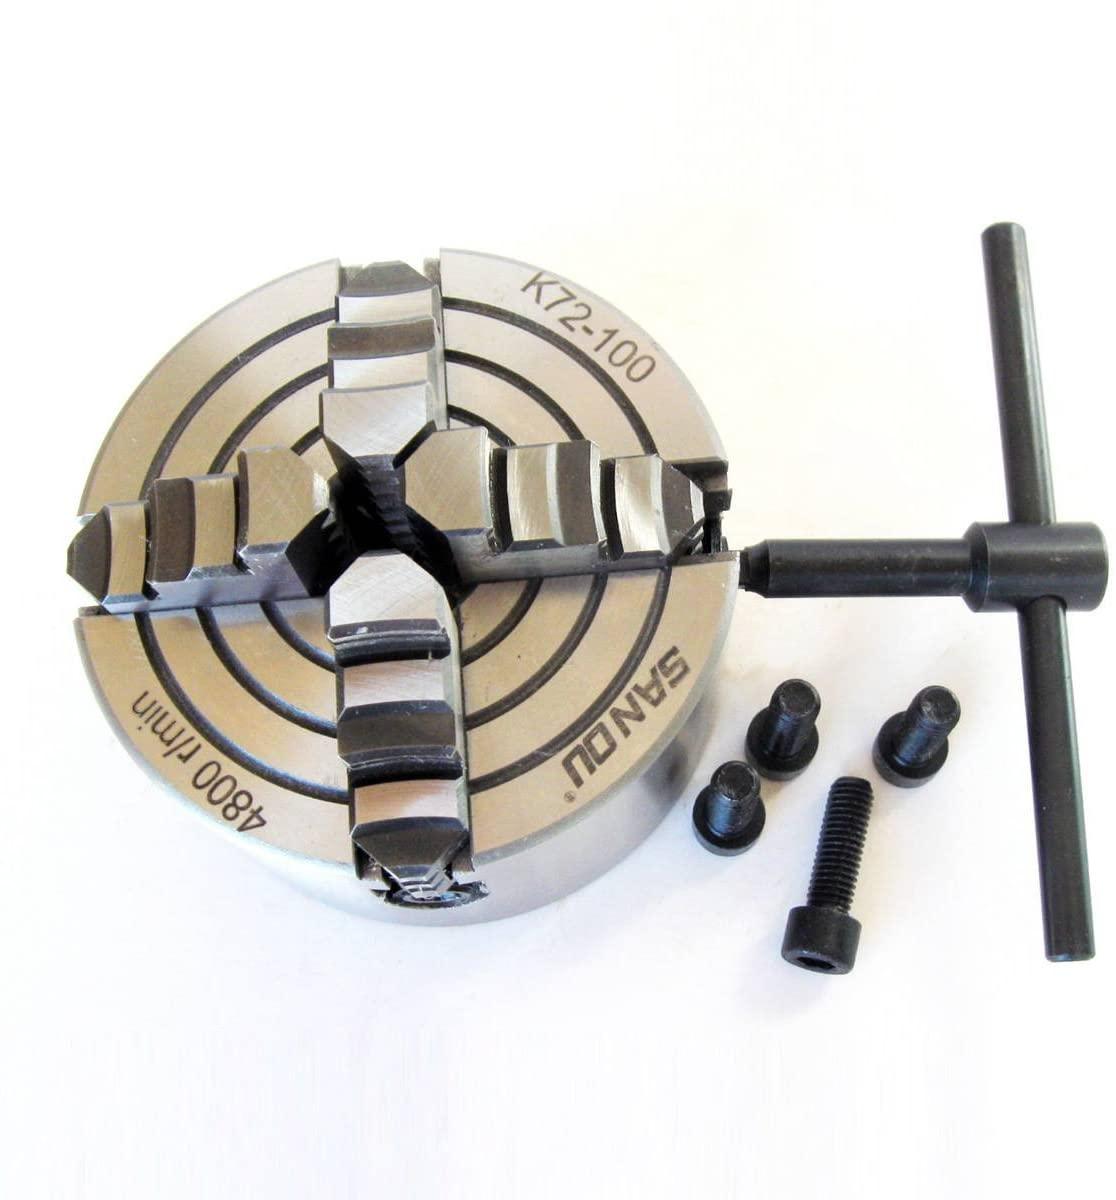 WS SANOU 100mm 4 '' K72-100 Four Jaw Chuck 4 Jaw Lathe Independent Chuck Turning Machine Tool